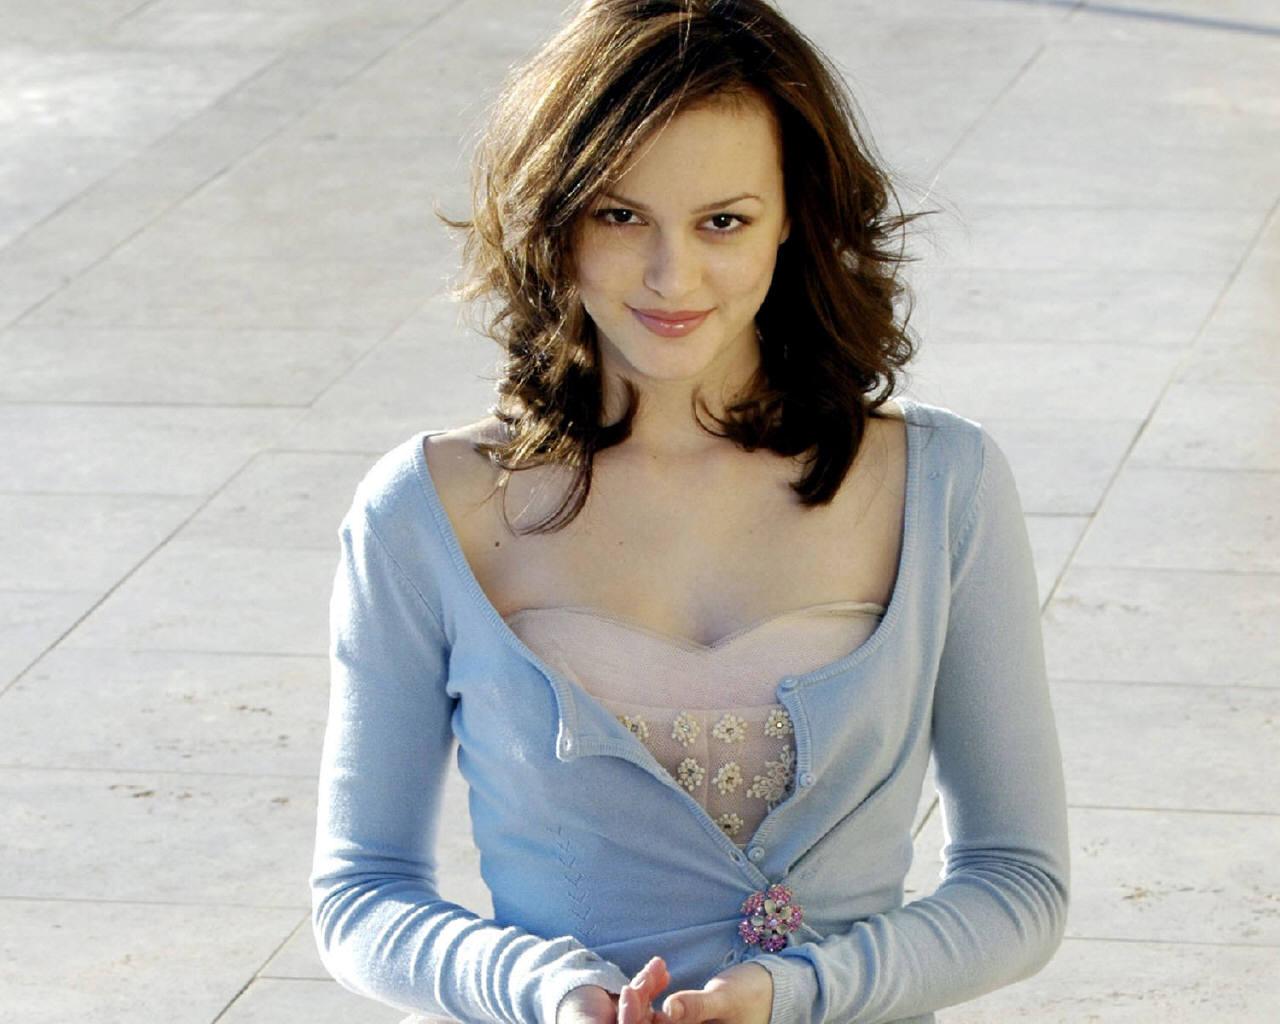 hot actress: leighton meester